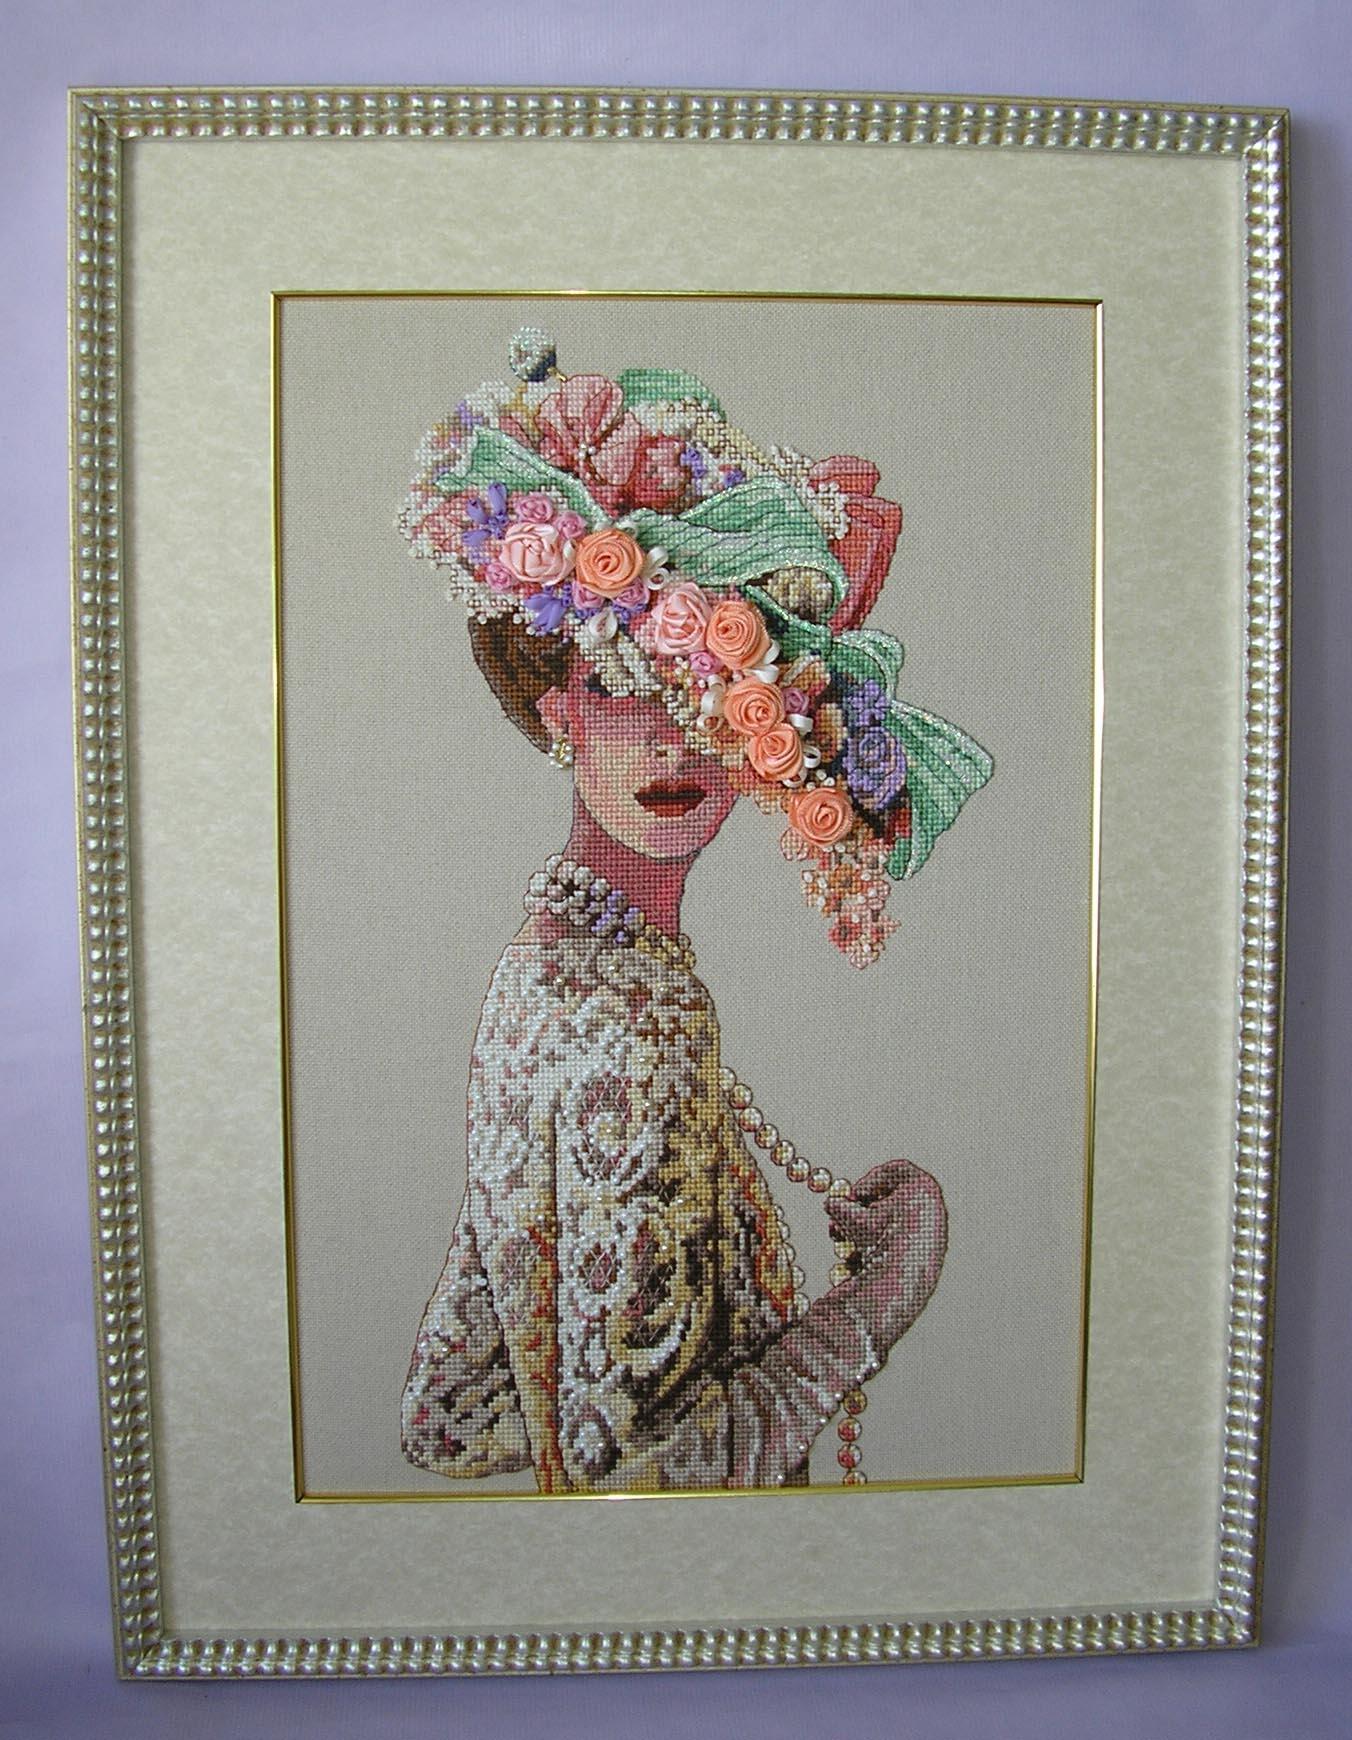 'Victorian Elegance' набор Dimensions. Портреты